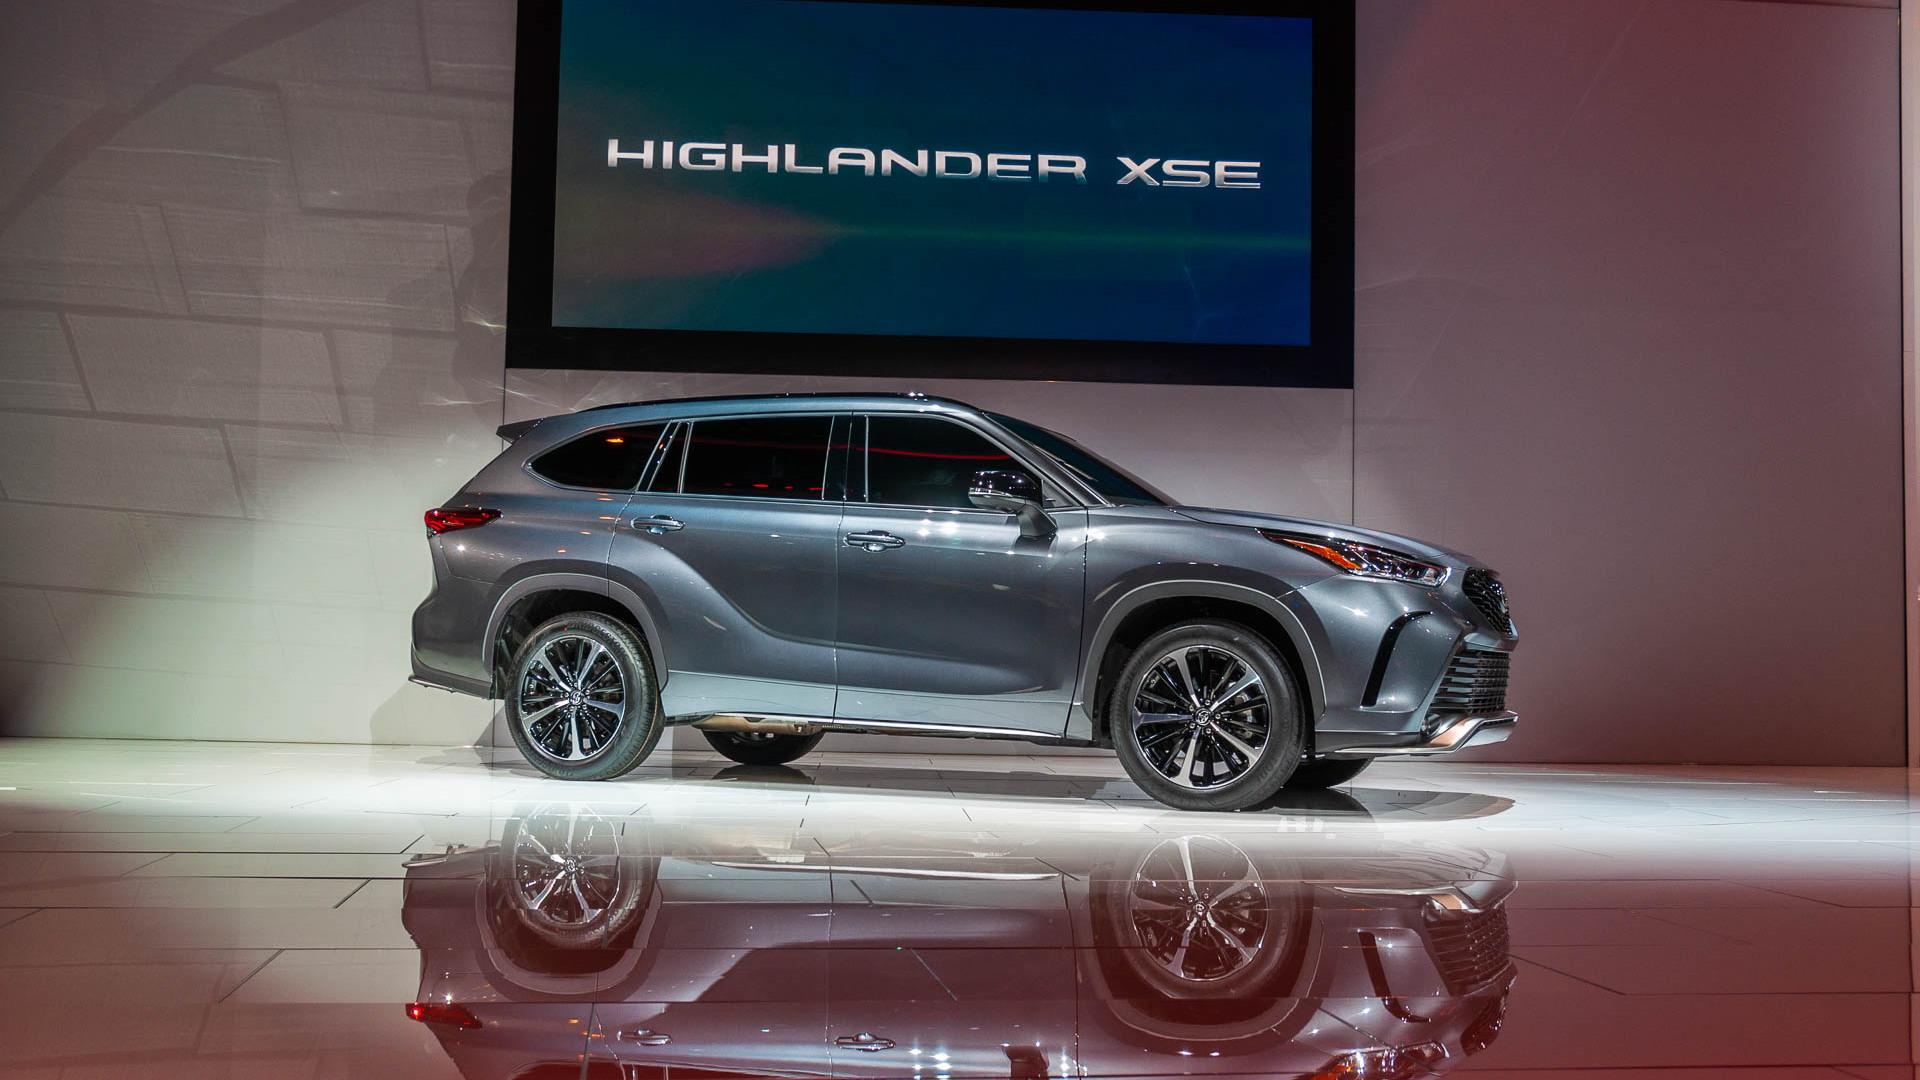 2021 Toyota Highlander XSE, 2020 Chicago Auto Show